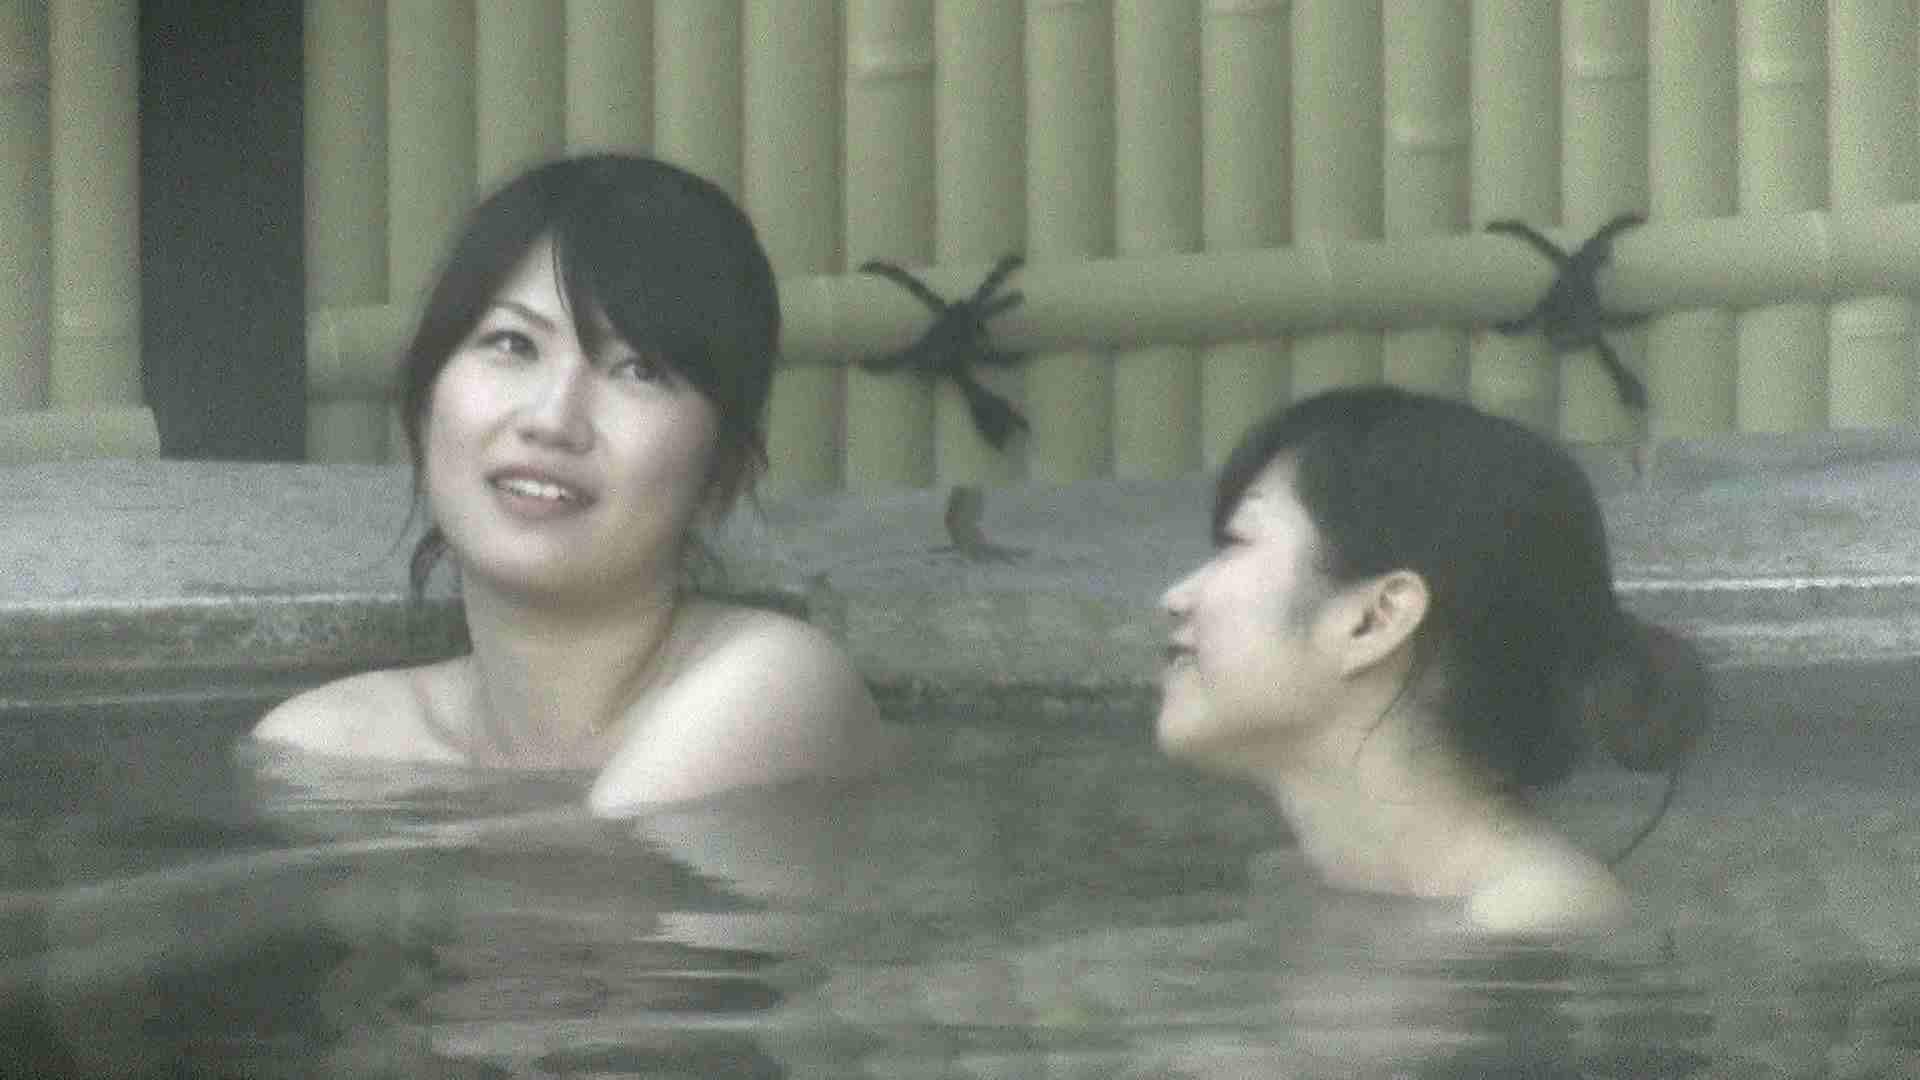 Aquaな露天風呂Vol.206 盗撮シリーズ | 露天風呂編  80PIX 3